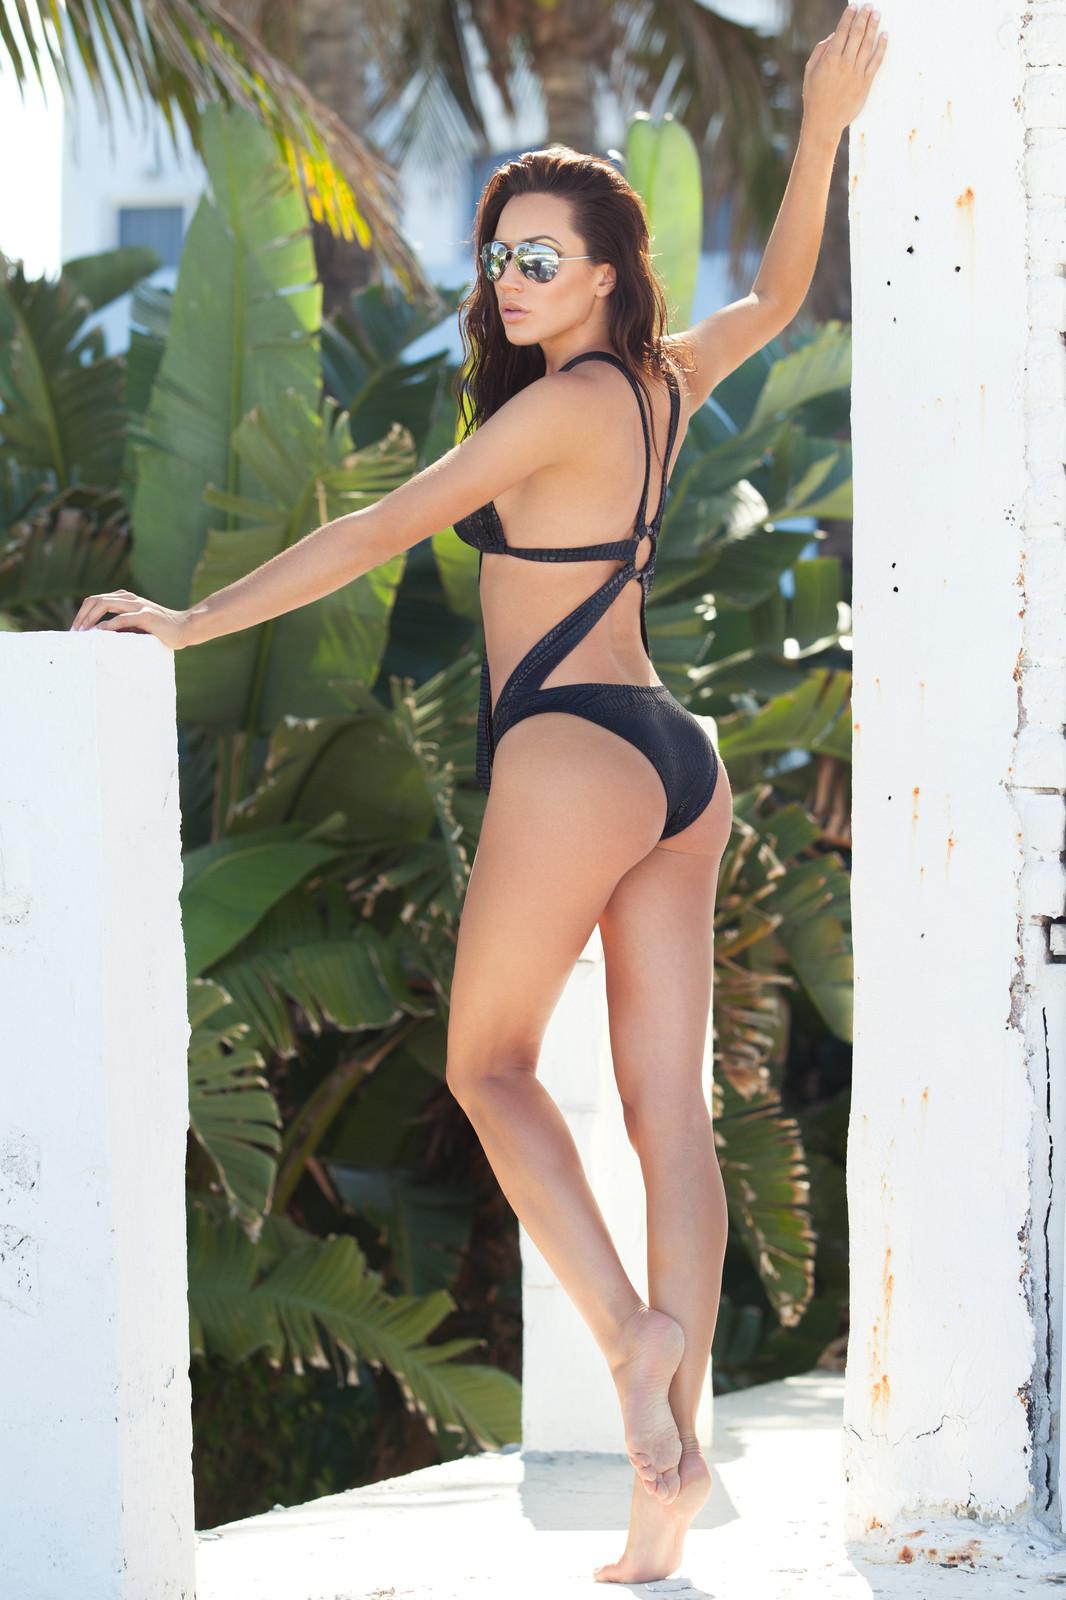 923290d30b7 Venao Swimwear | Luxury Bikinis | Toronto | Canada